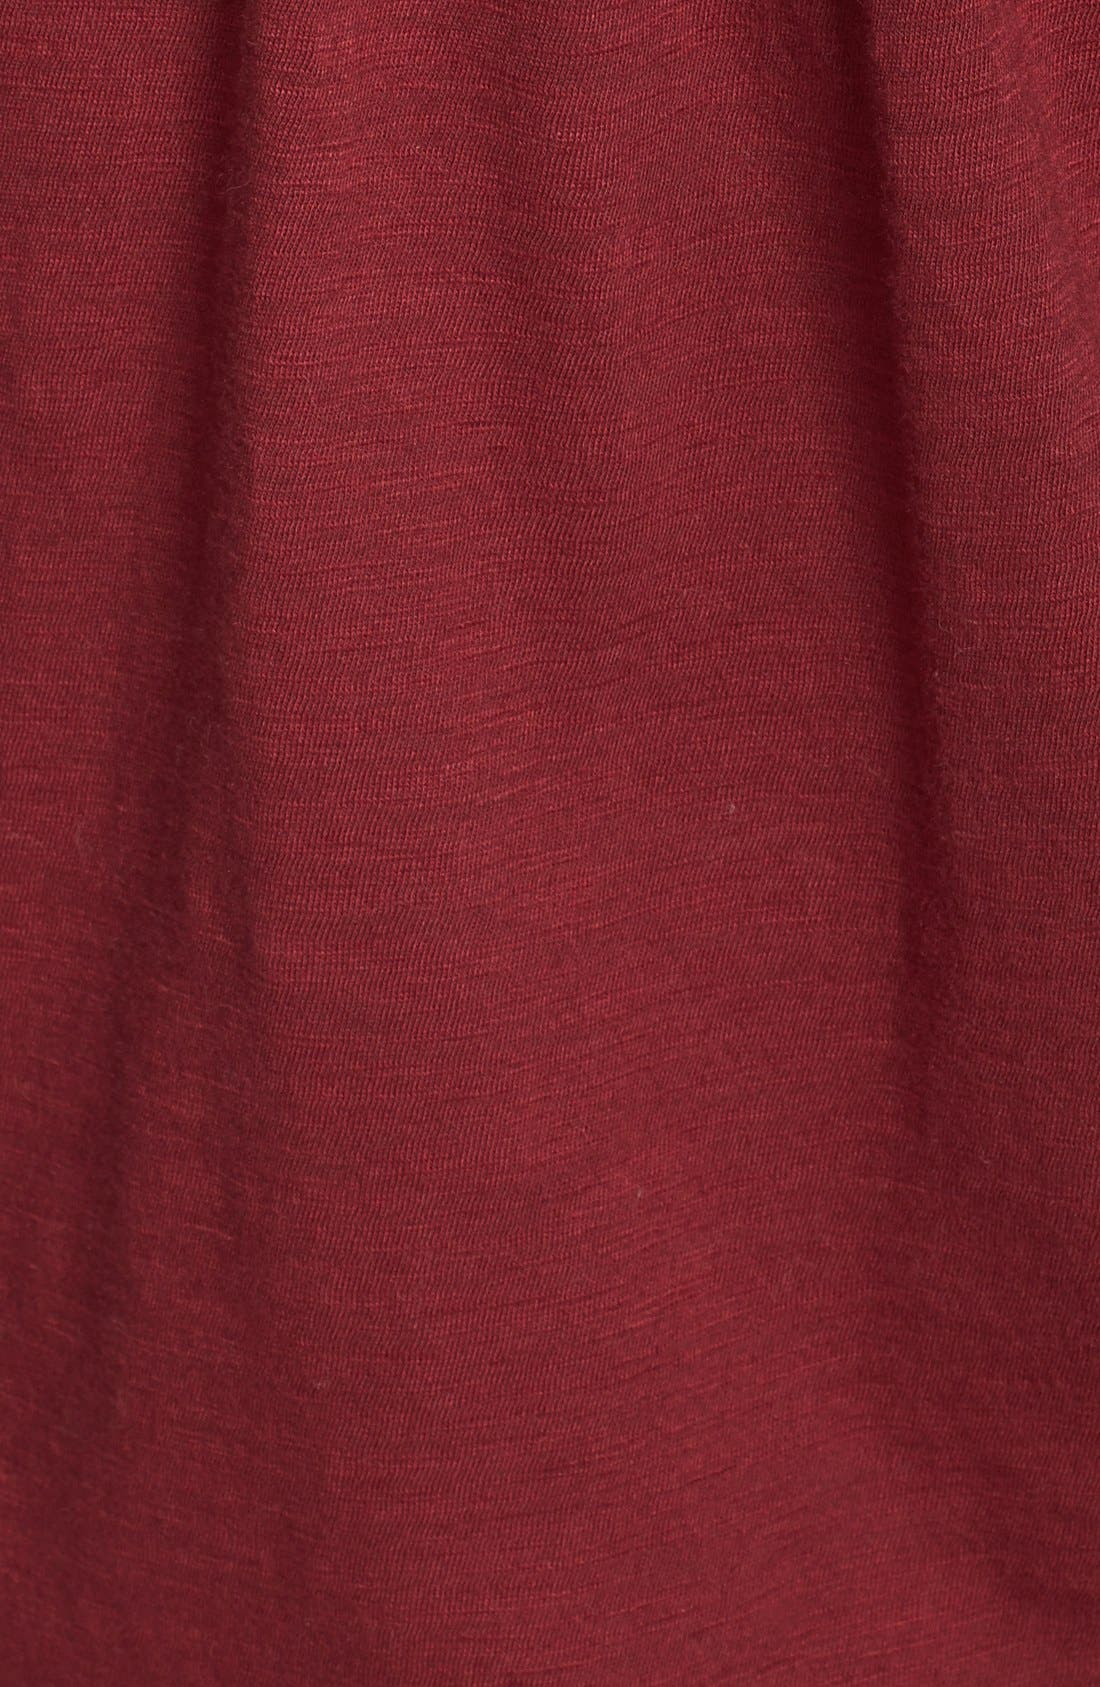 Alternate Image 3  - Lucky Brand Lace Tuxedo Bib Top